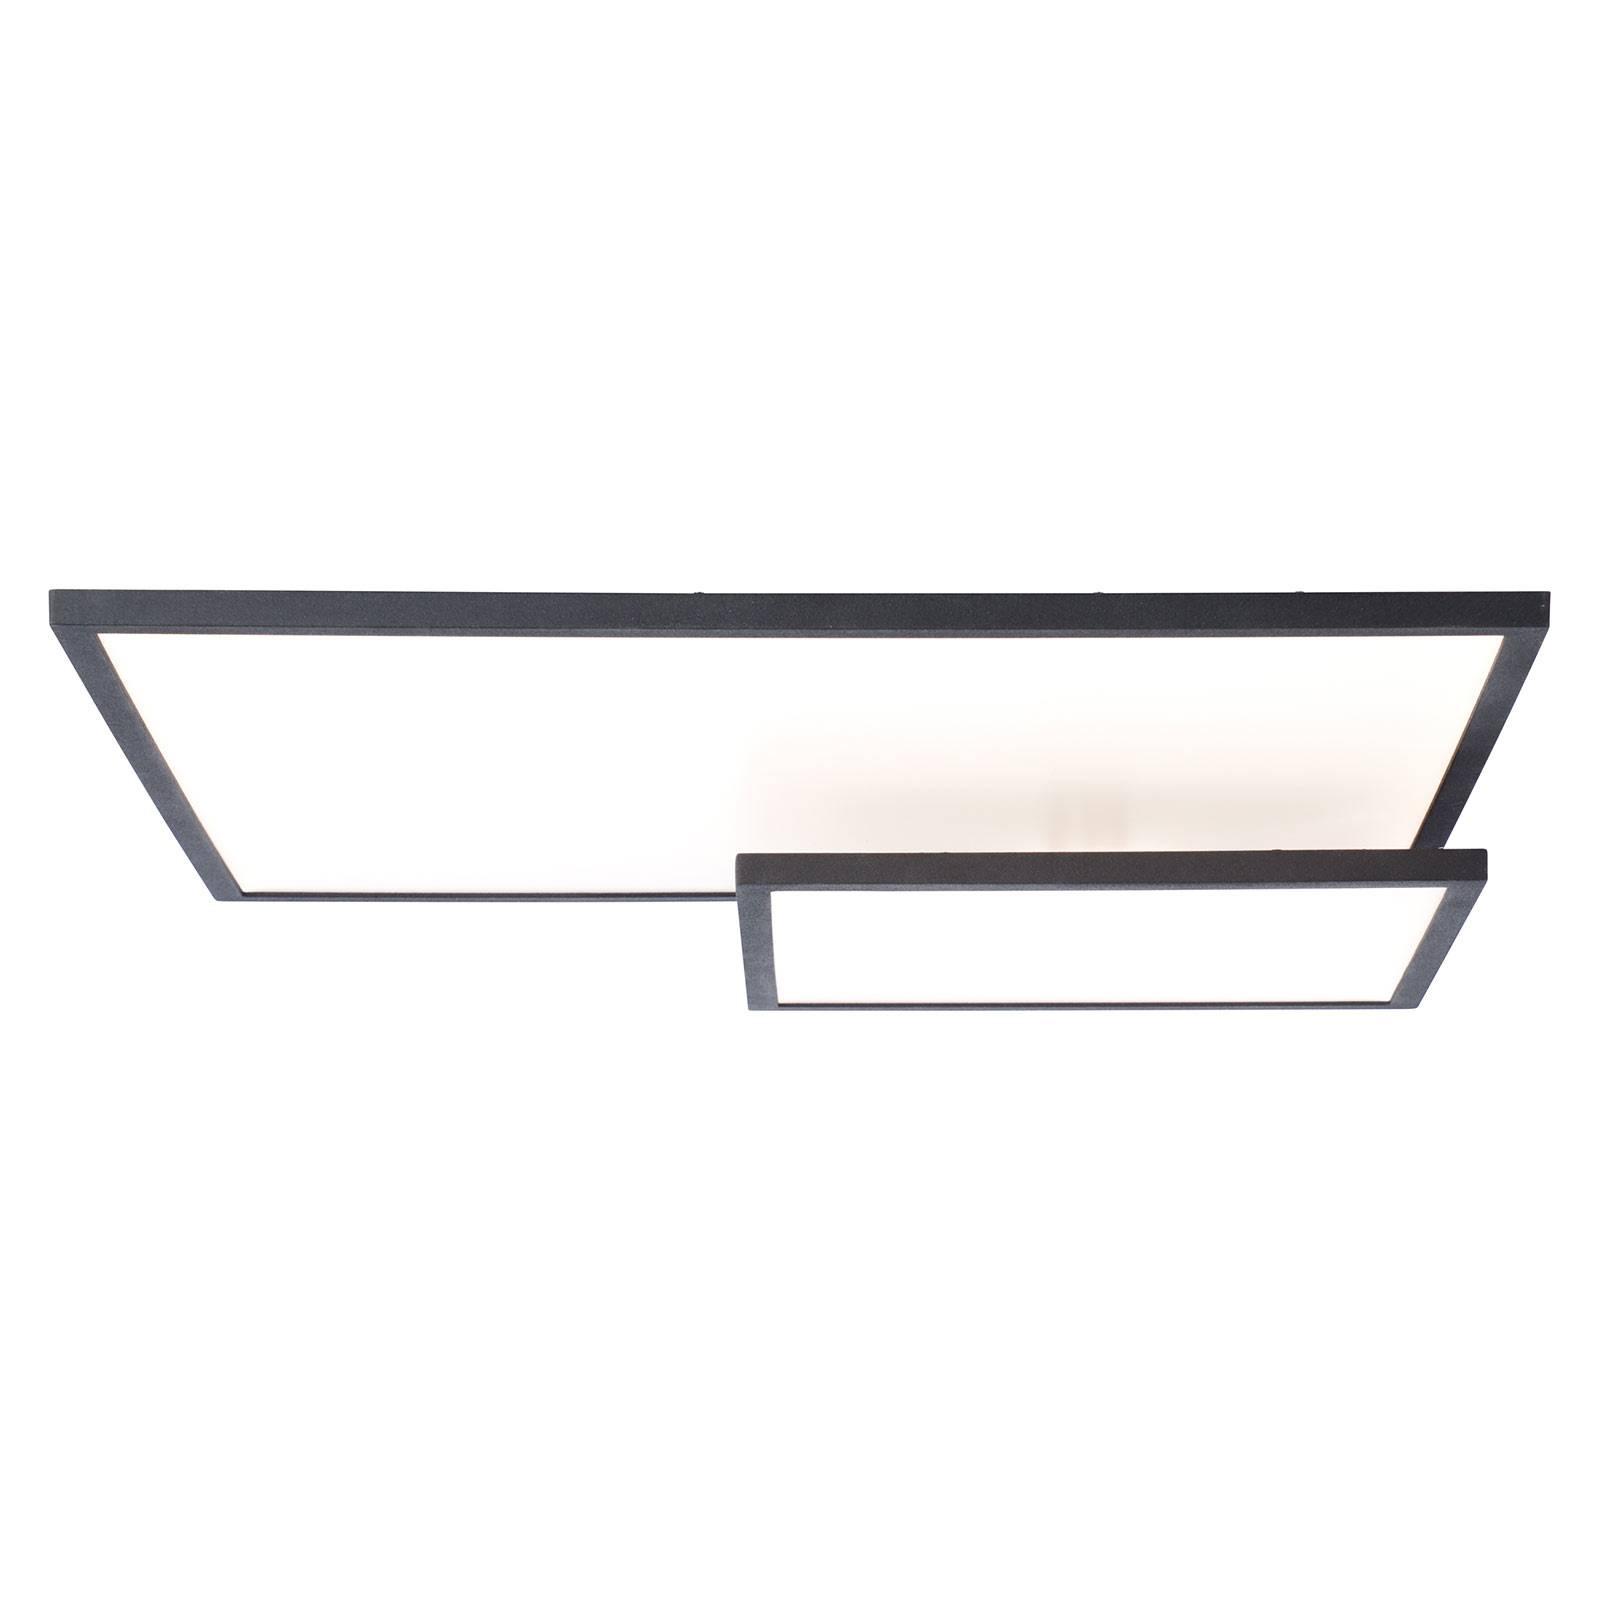 Lampa sufitowa LED Bility prostokątna czarna ramka